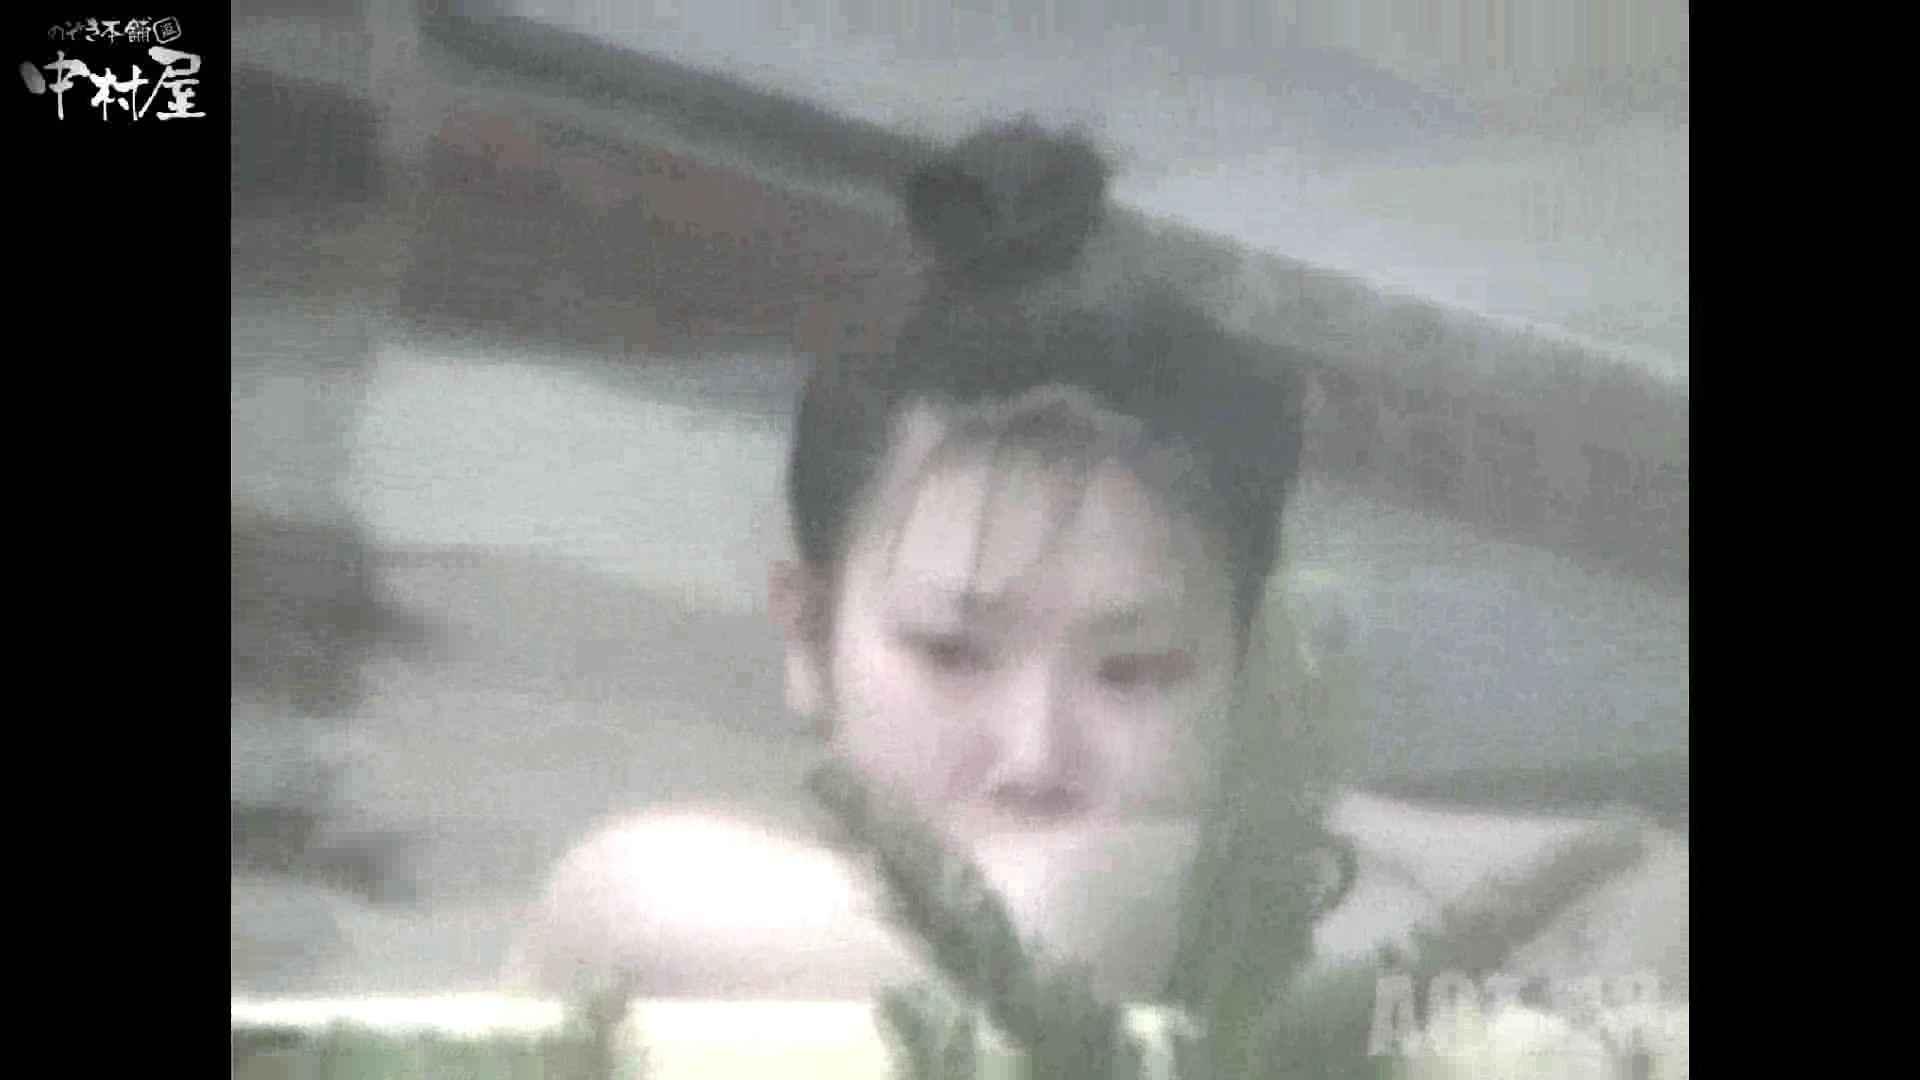 Aquaな露天風呂Vol.882潜入盗撮露天風呂十八判湯 其の二 潜入 おめこ無修正動画無料 90画像 11